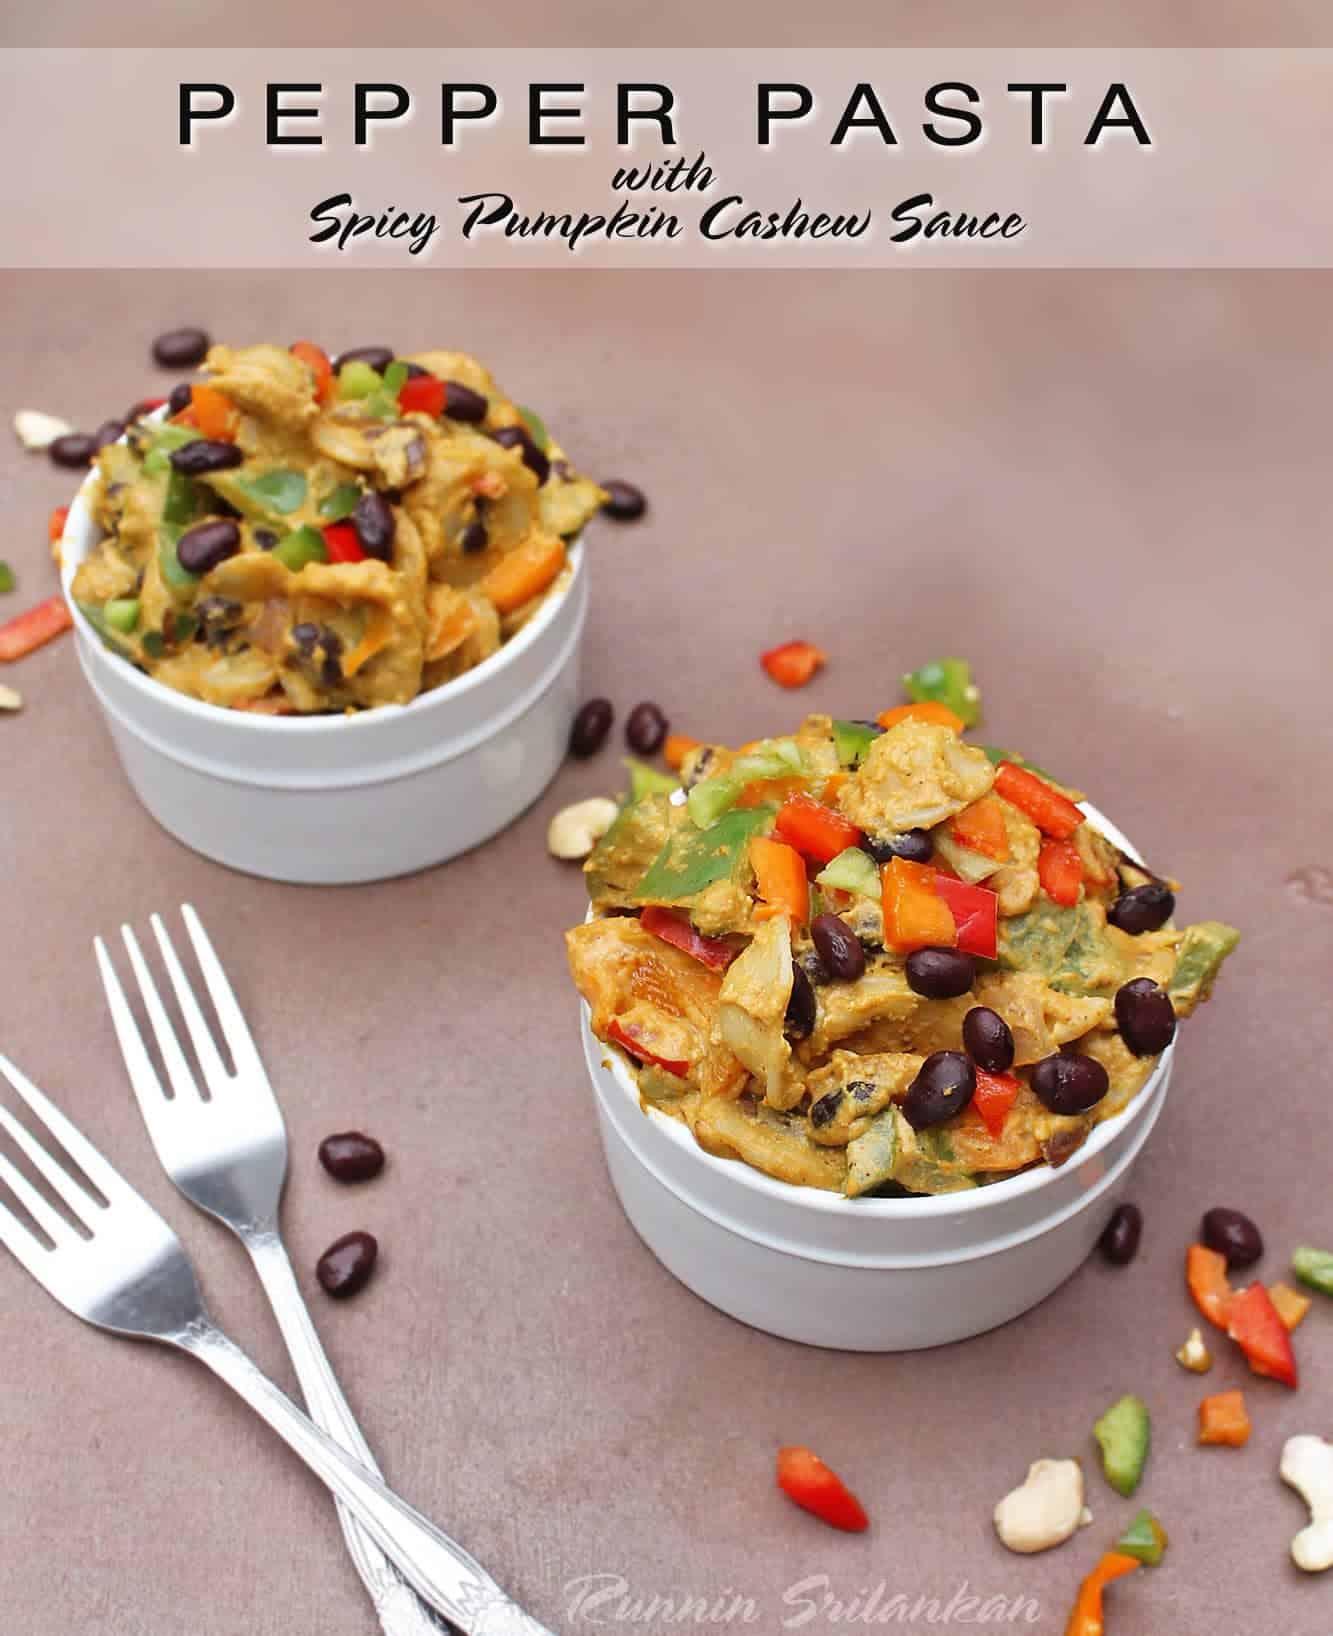 pepper pasta with dairy free spicy pumpkin cashew cream sauce